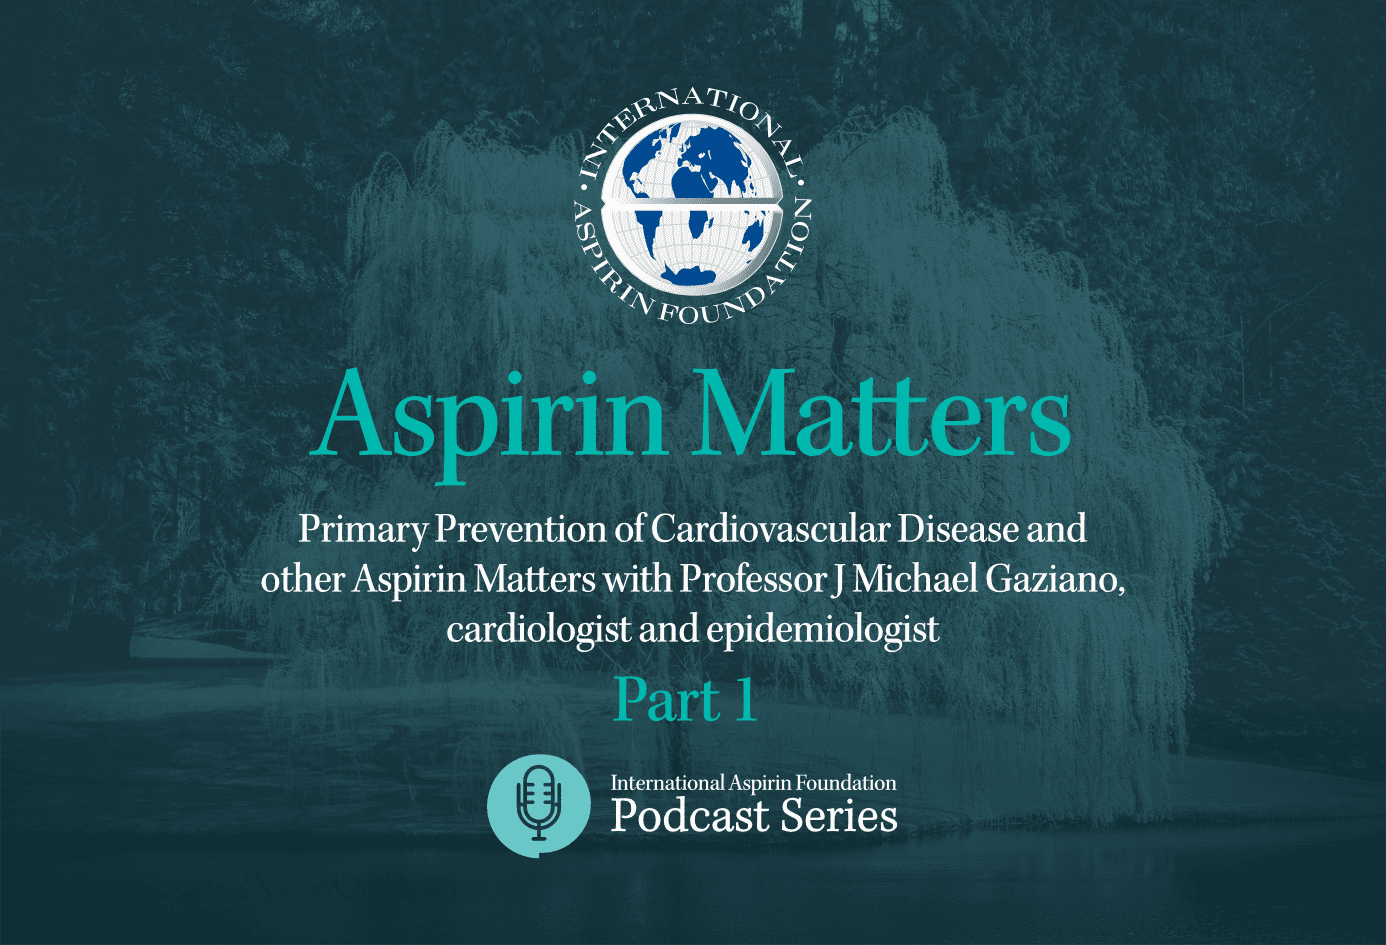 Aspirin Matter Podcasts 110221 Page 4